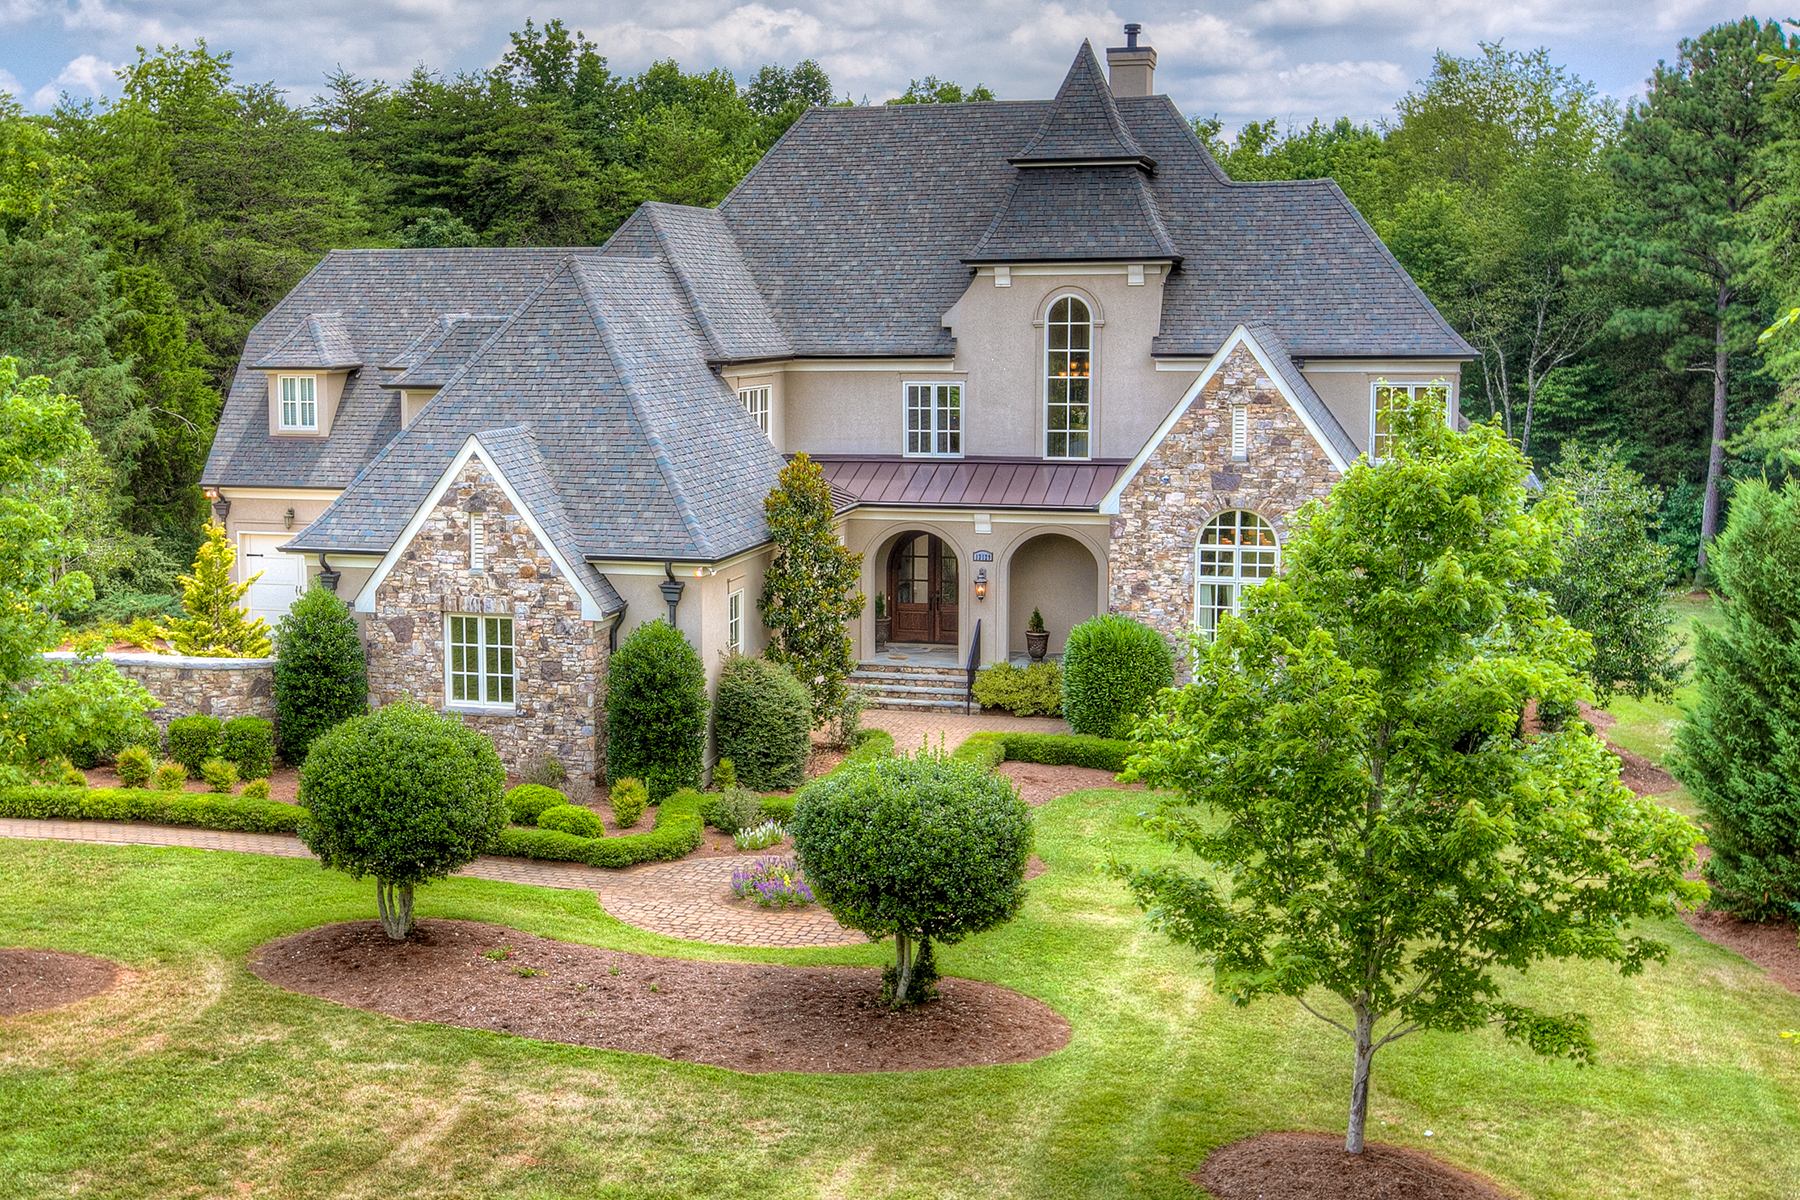 Single Family Home for Sale at 13129 Ninebark Trl , Charlotte, NC 28278 13129 Ninebark Trl Charlotte, North Carolina, 28278 United States